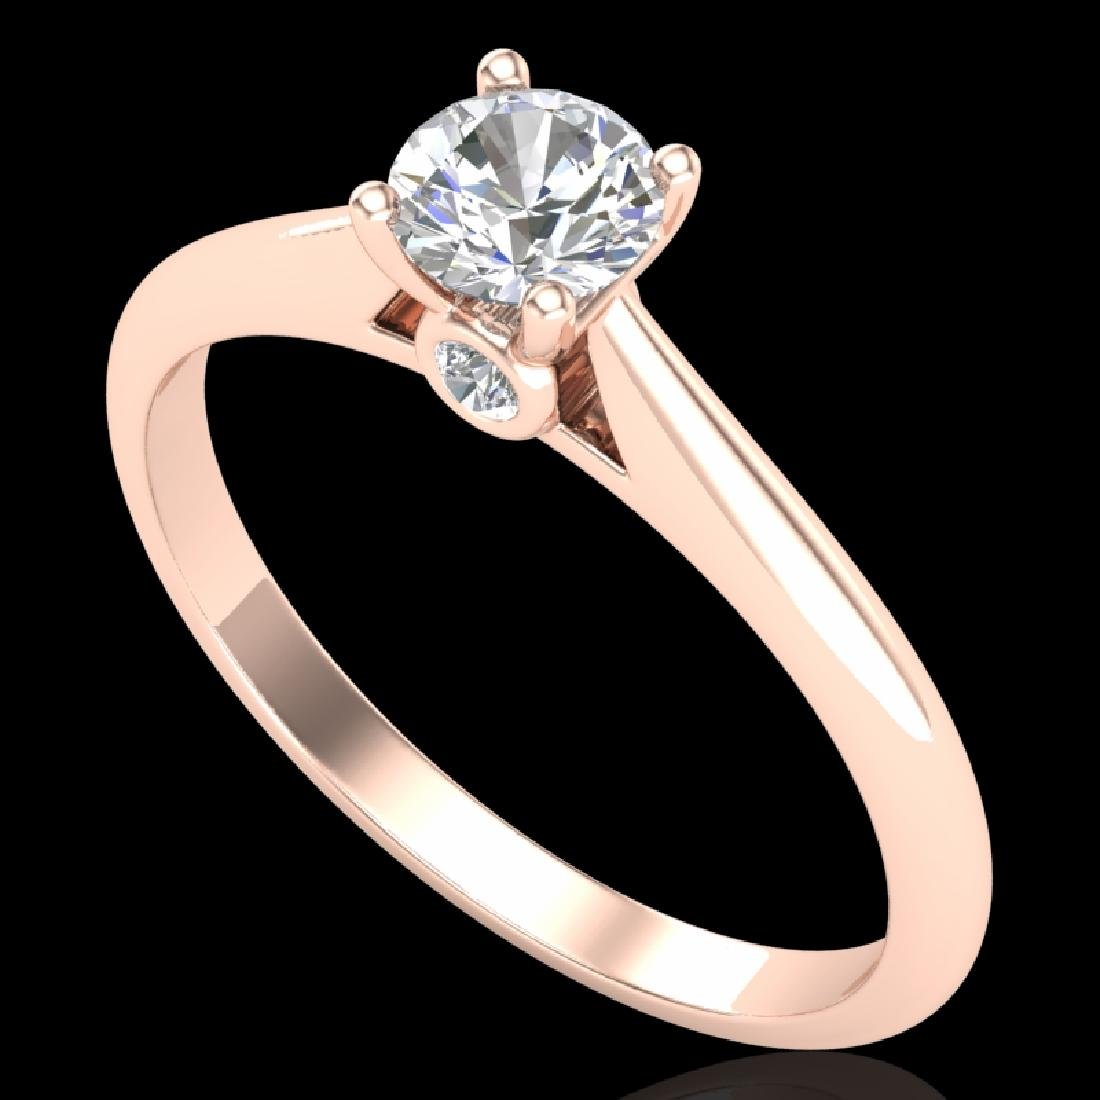 0.4 CTW VS/SI Diamond Solitaire Art Deco Ring 18K Rose